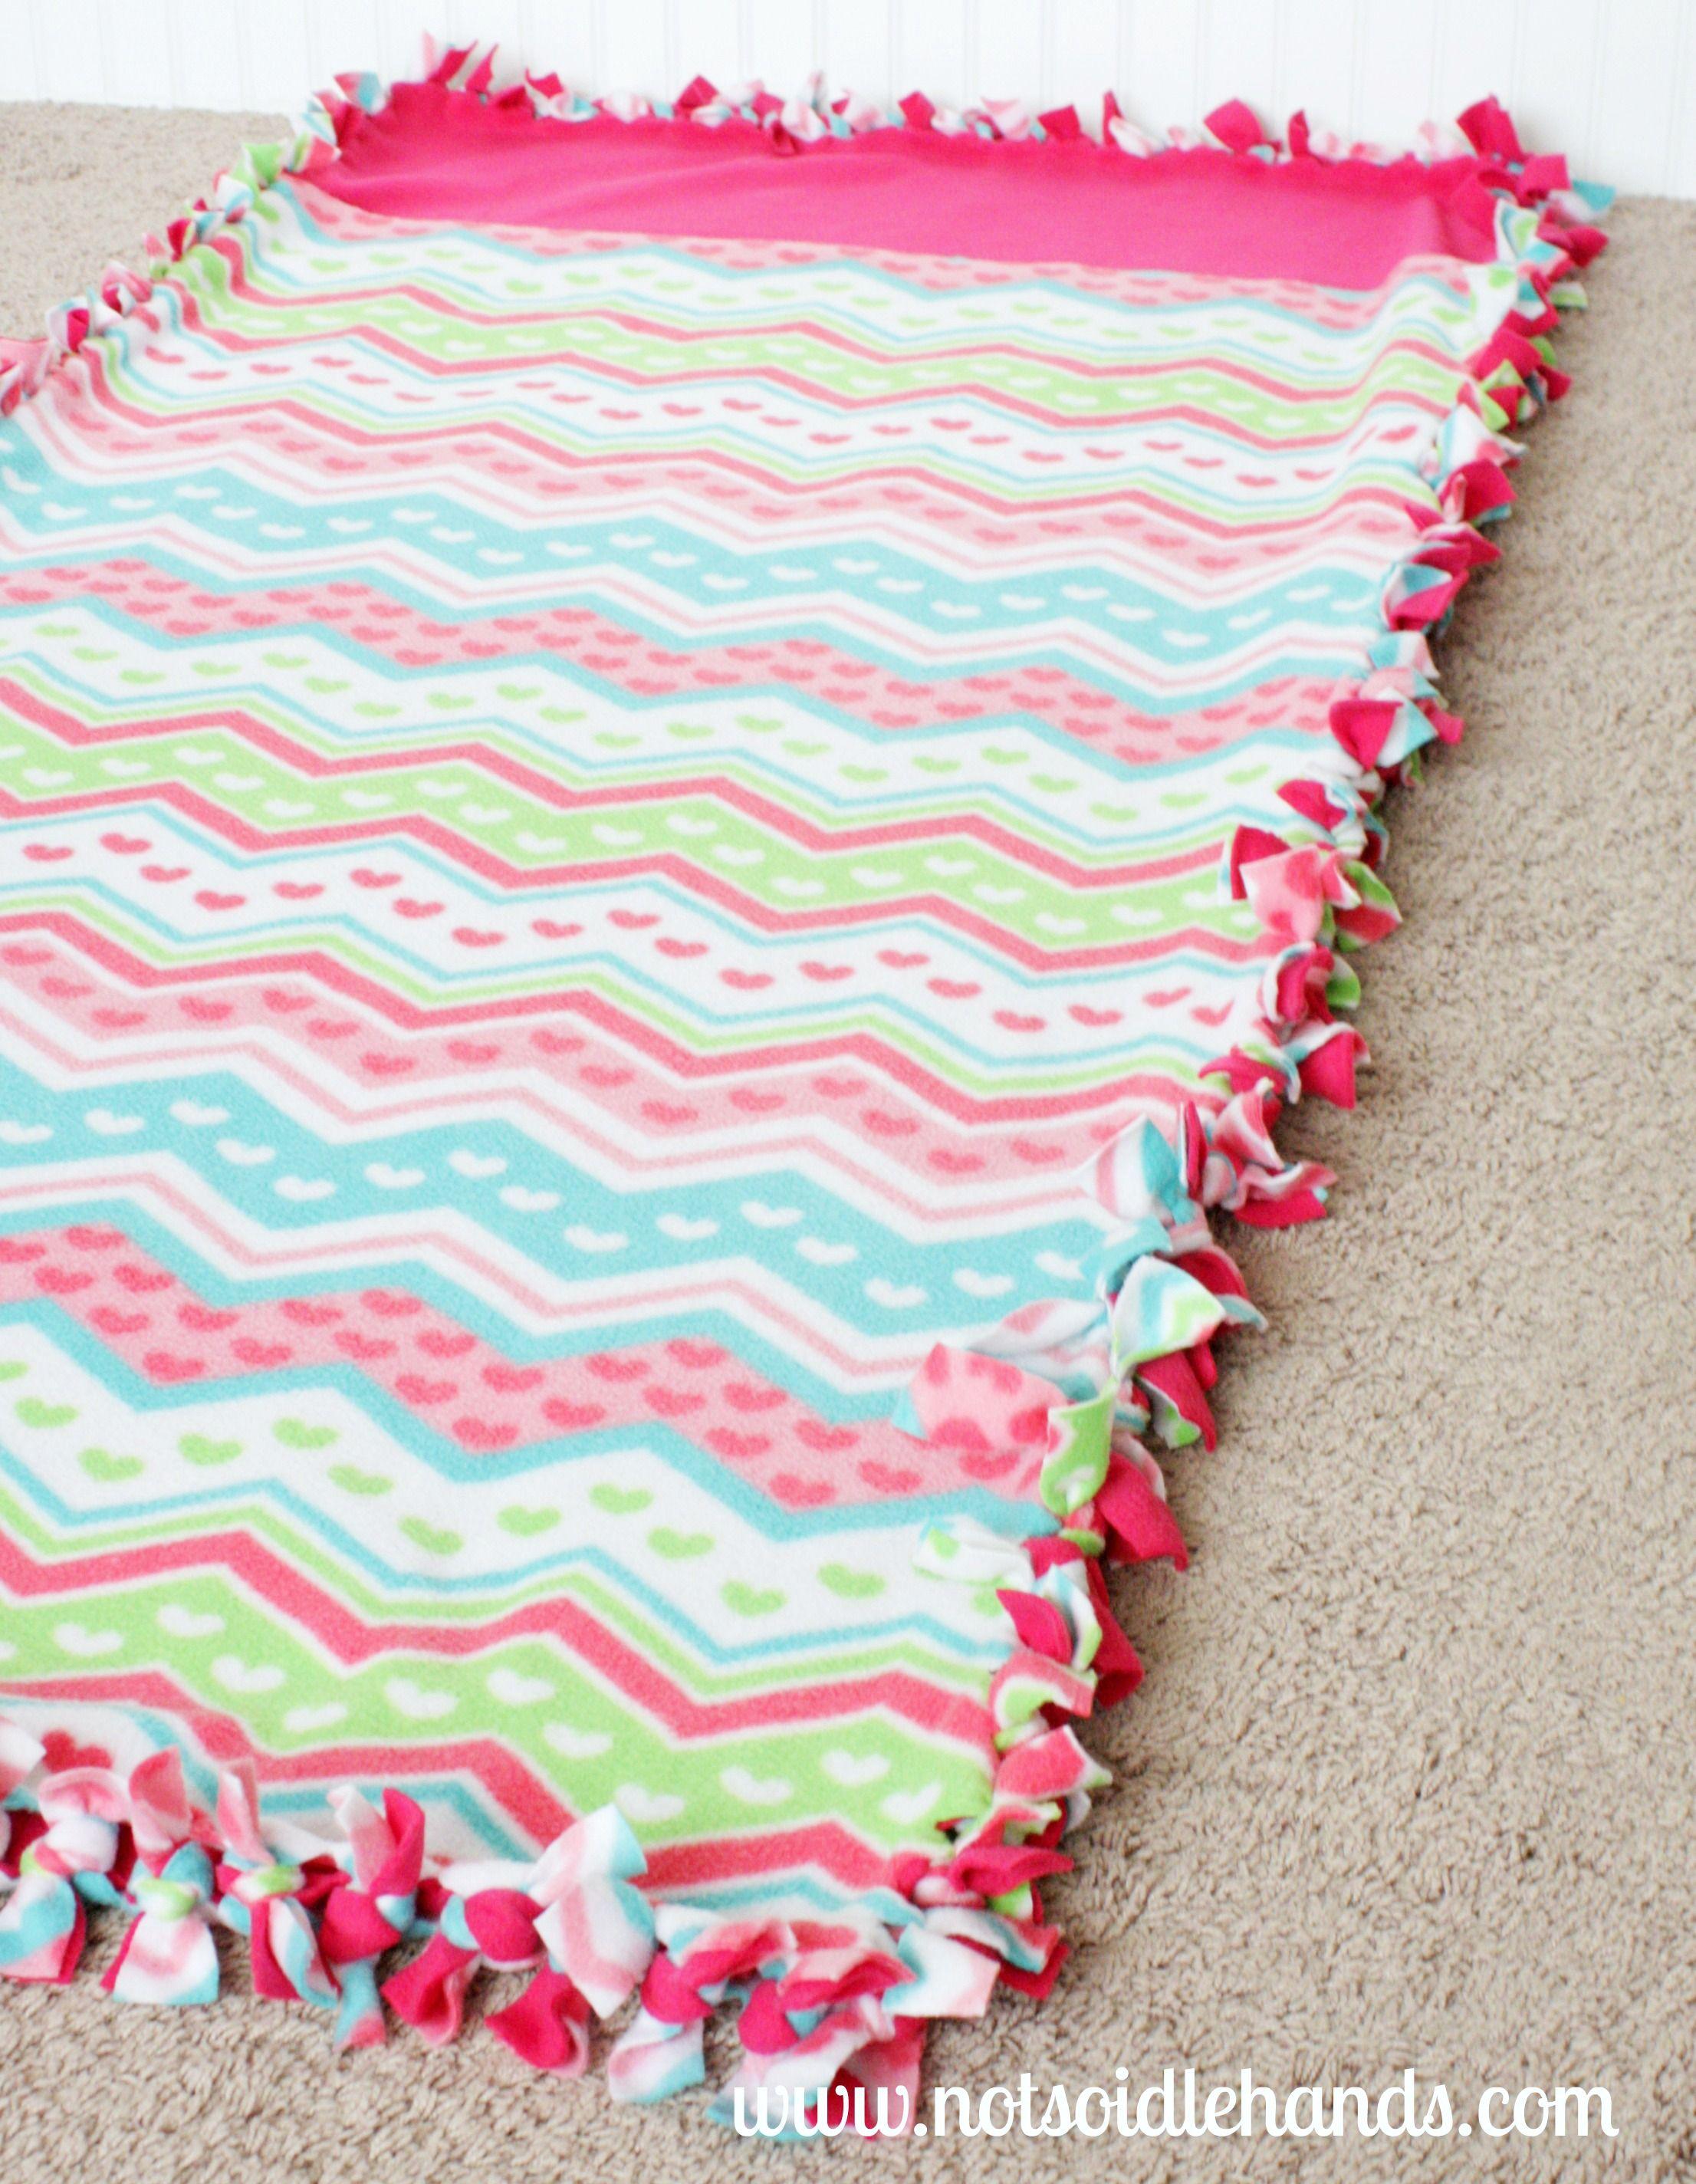 no sew sleeping bag for kids makes a great gift notsoidlehands